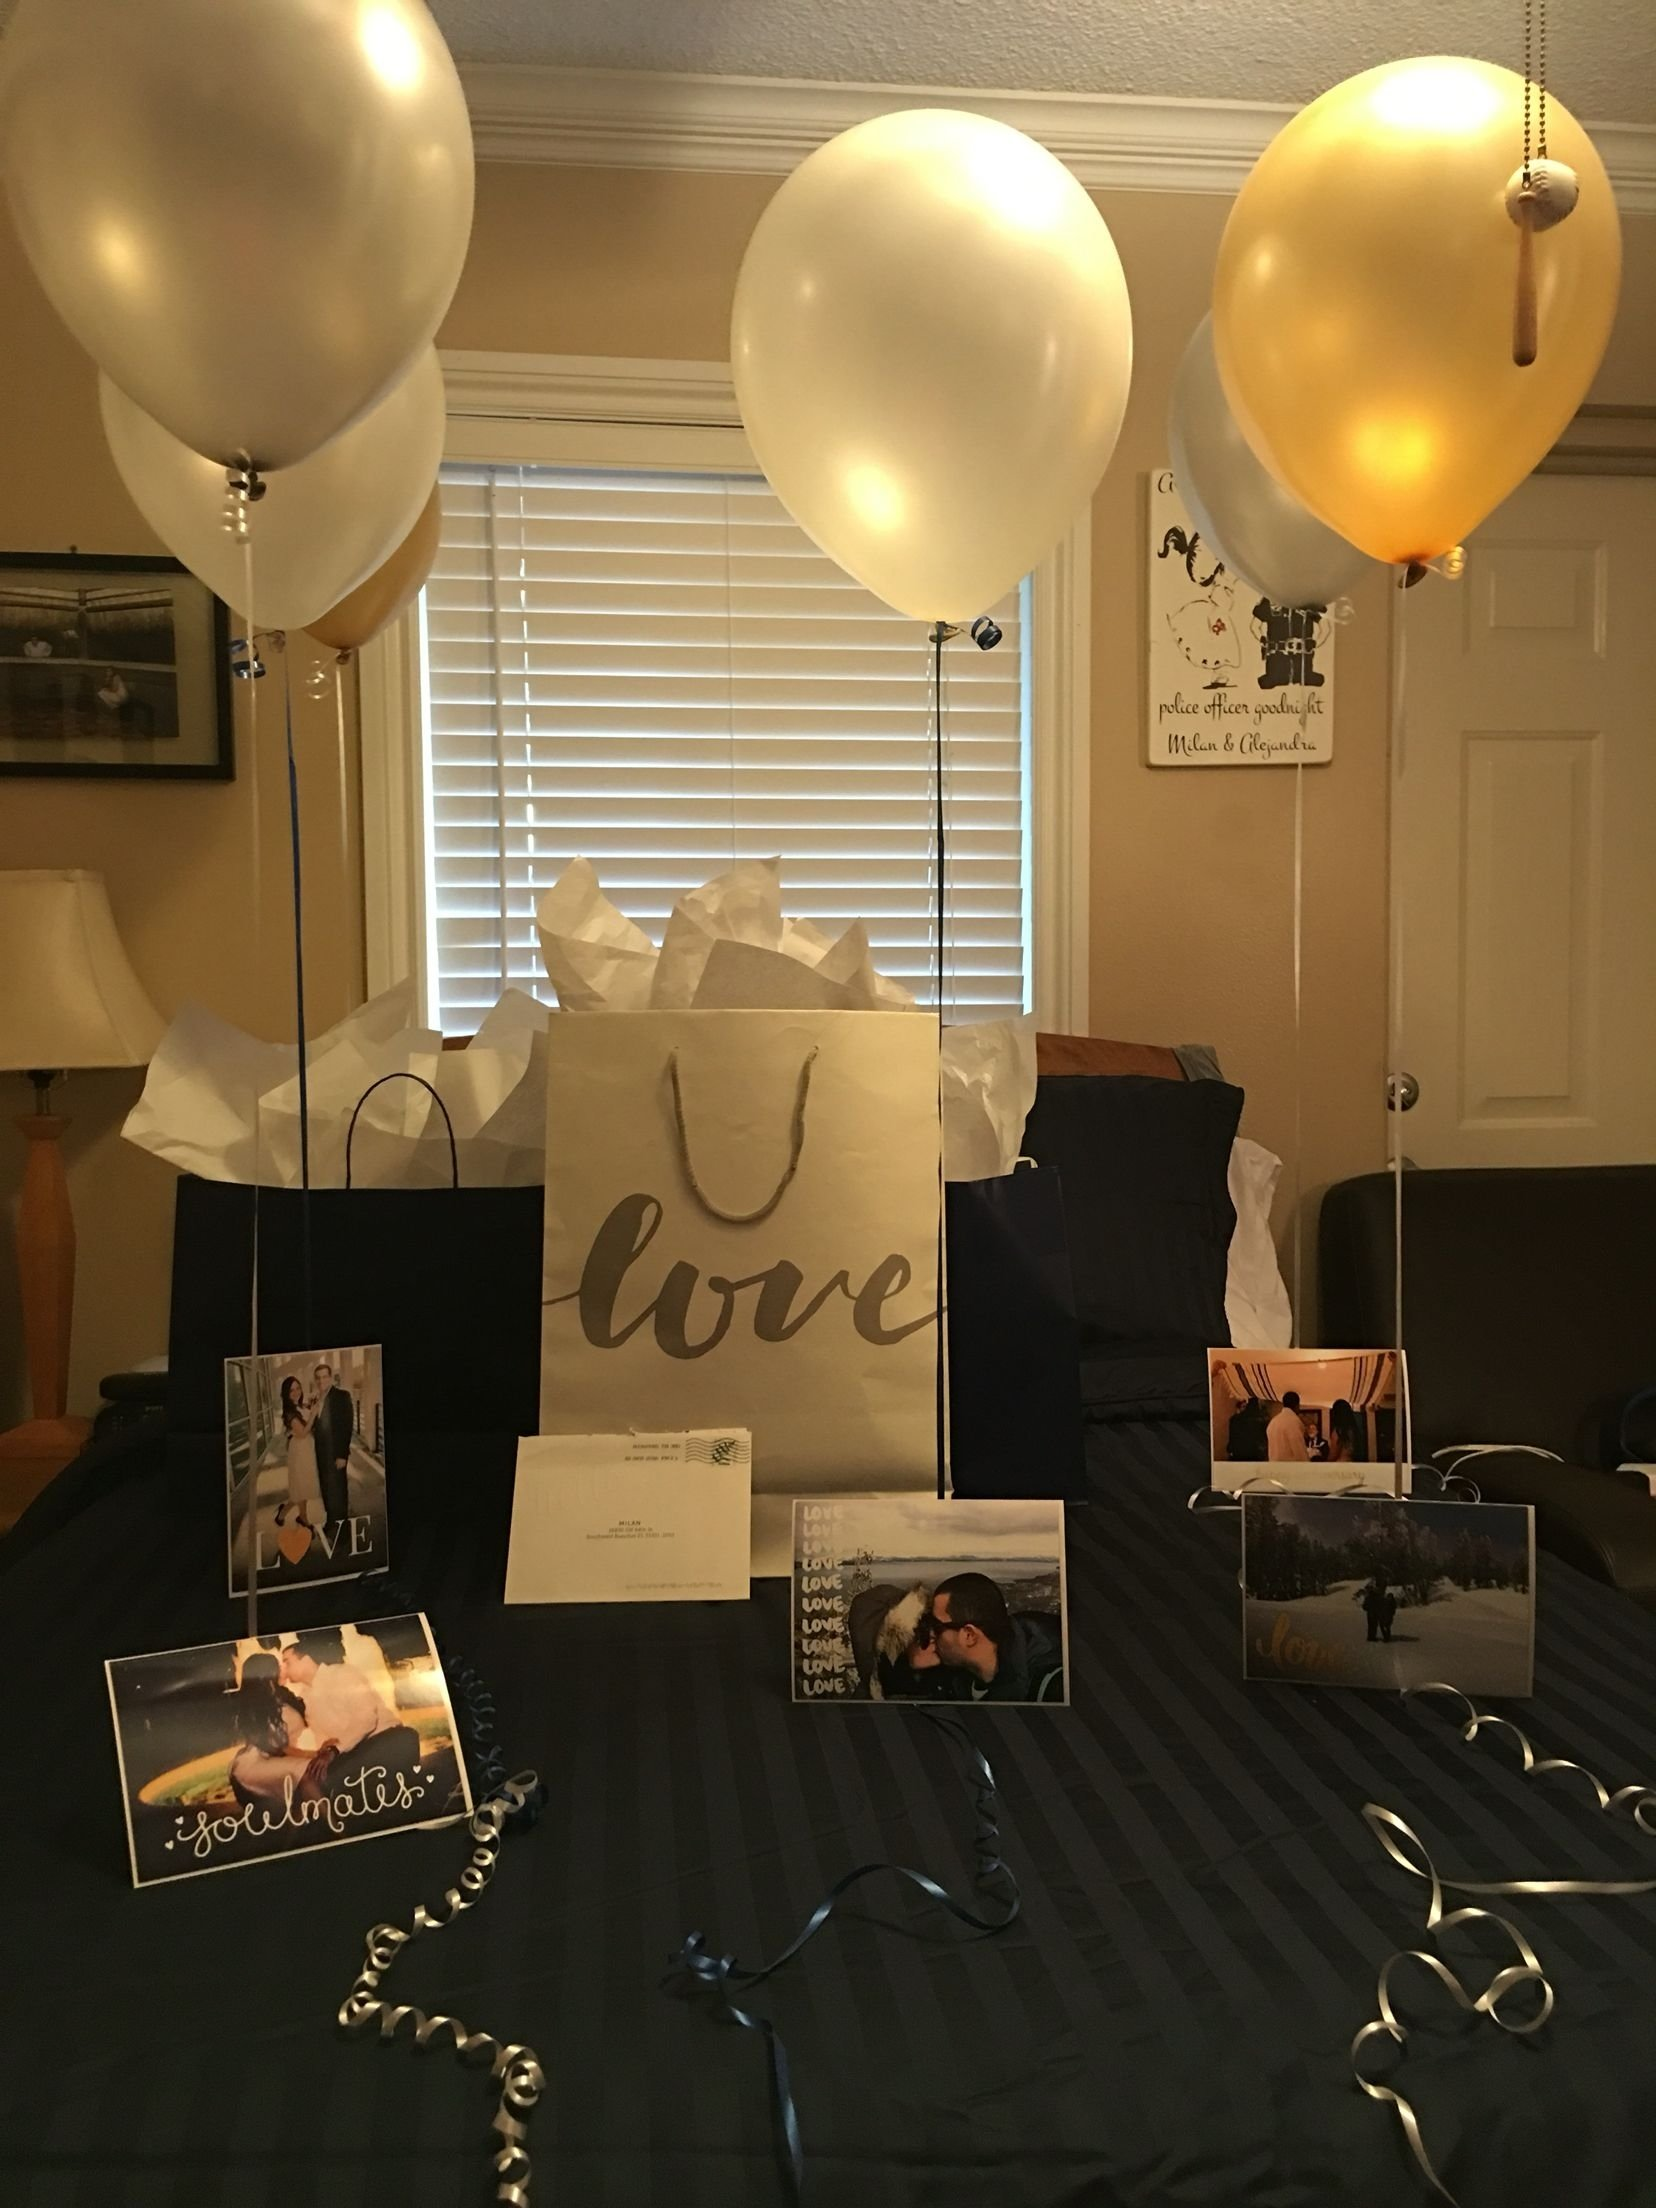 10 Lovable Romantic 1 Year Anniversary Ideas one year anniversary pinteres 3 2020